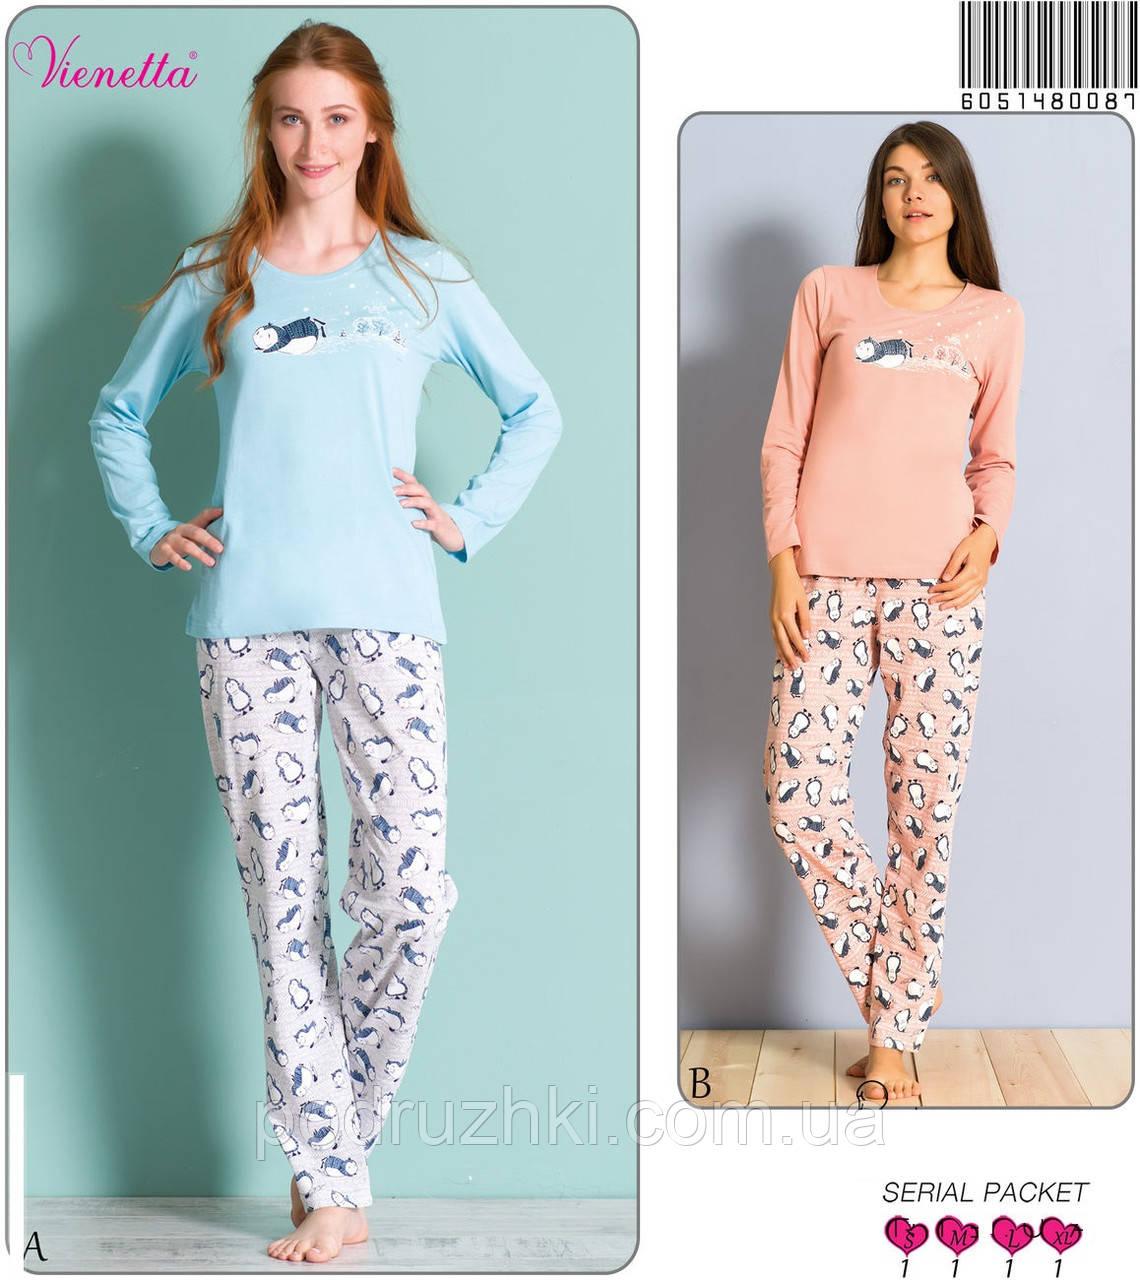 439e08a174a Домашний костюм женский - пижама VIENETTA  продажа